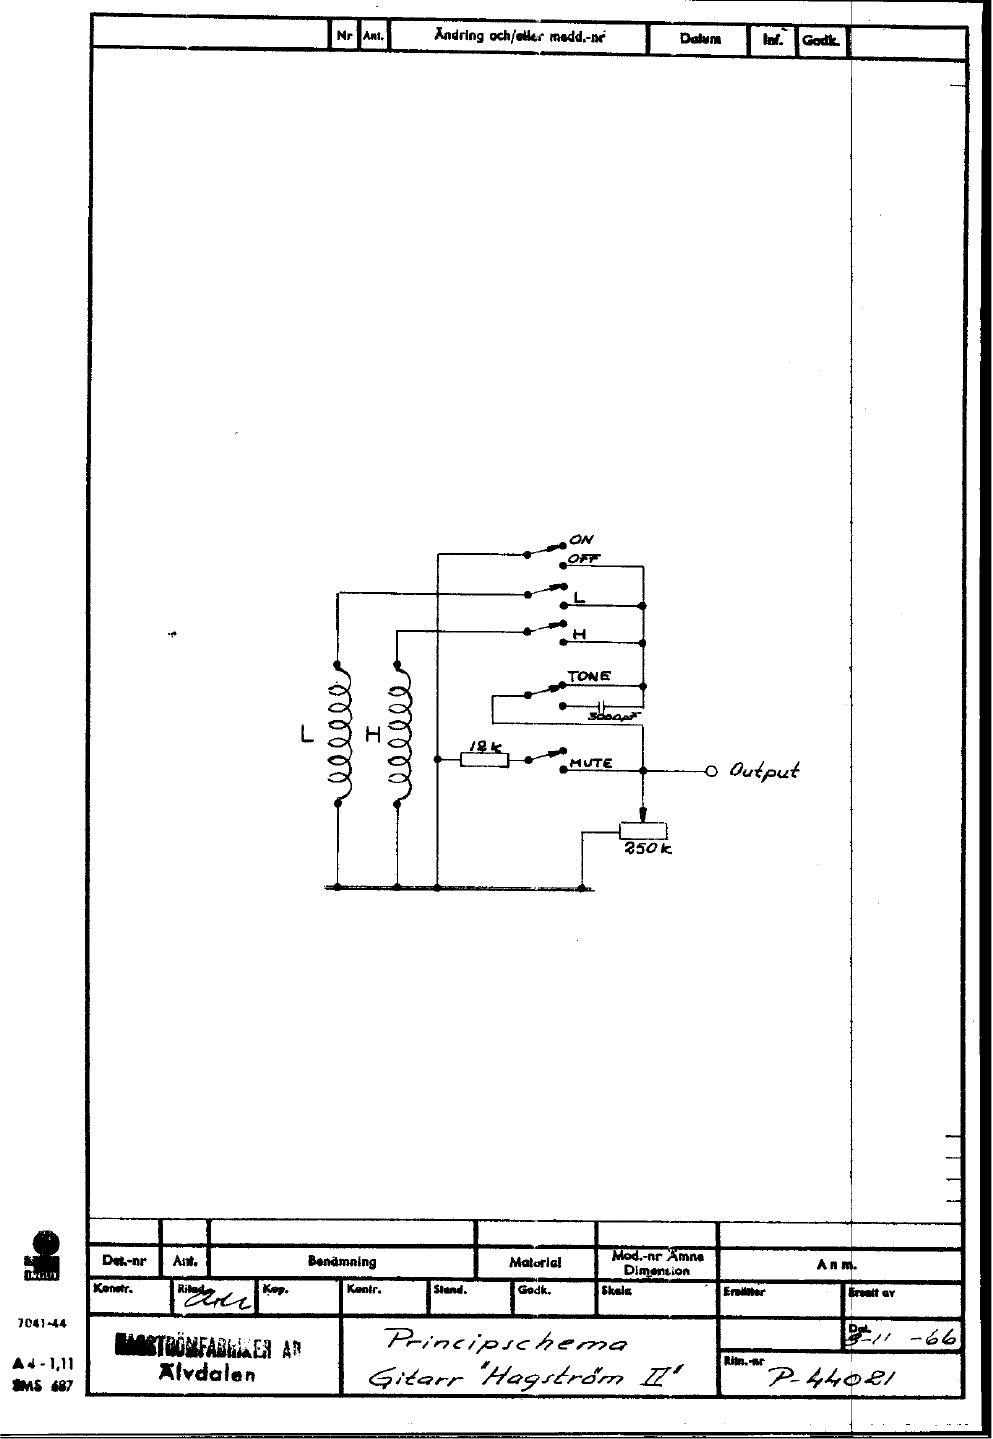 Hagstrom Guitar Wiring Diagram : Hagstrom wiring diagrams sl diagram